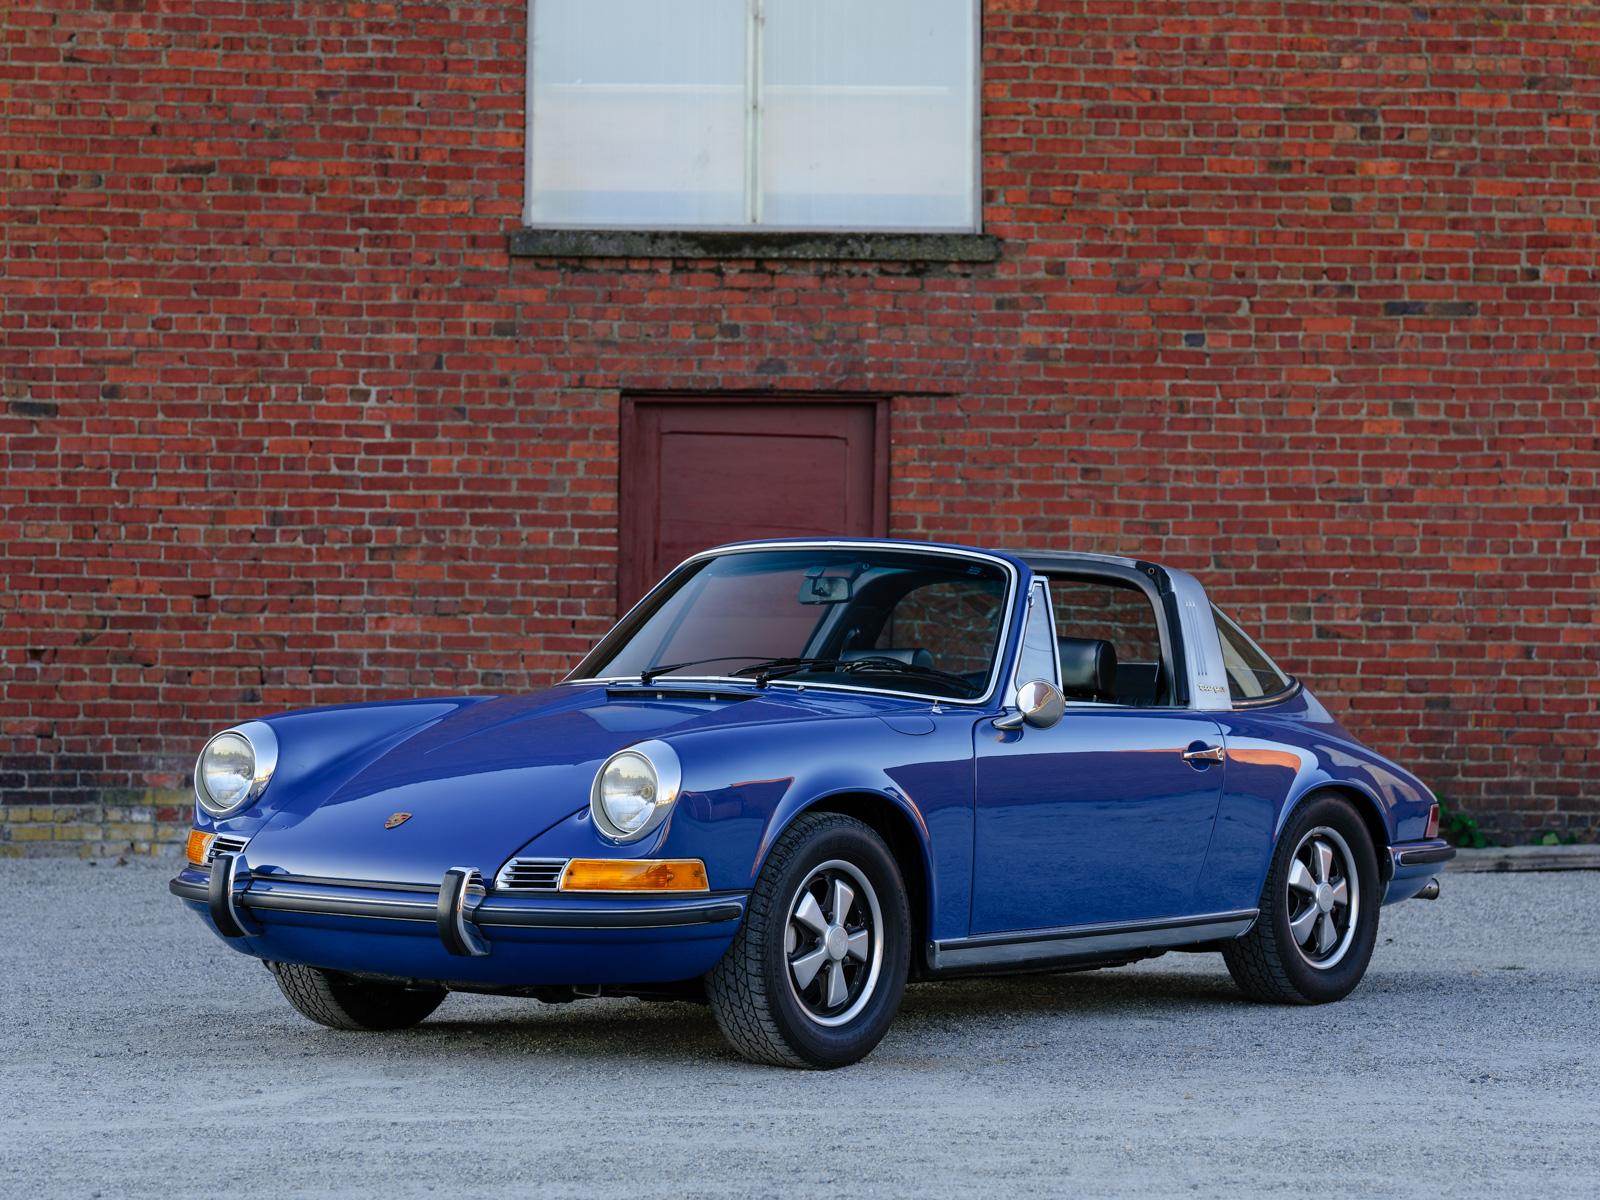 Portland Car Dealerships >> 1969 Porsche 911E Targa - Silver Arrow Cars Ltd.